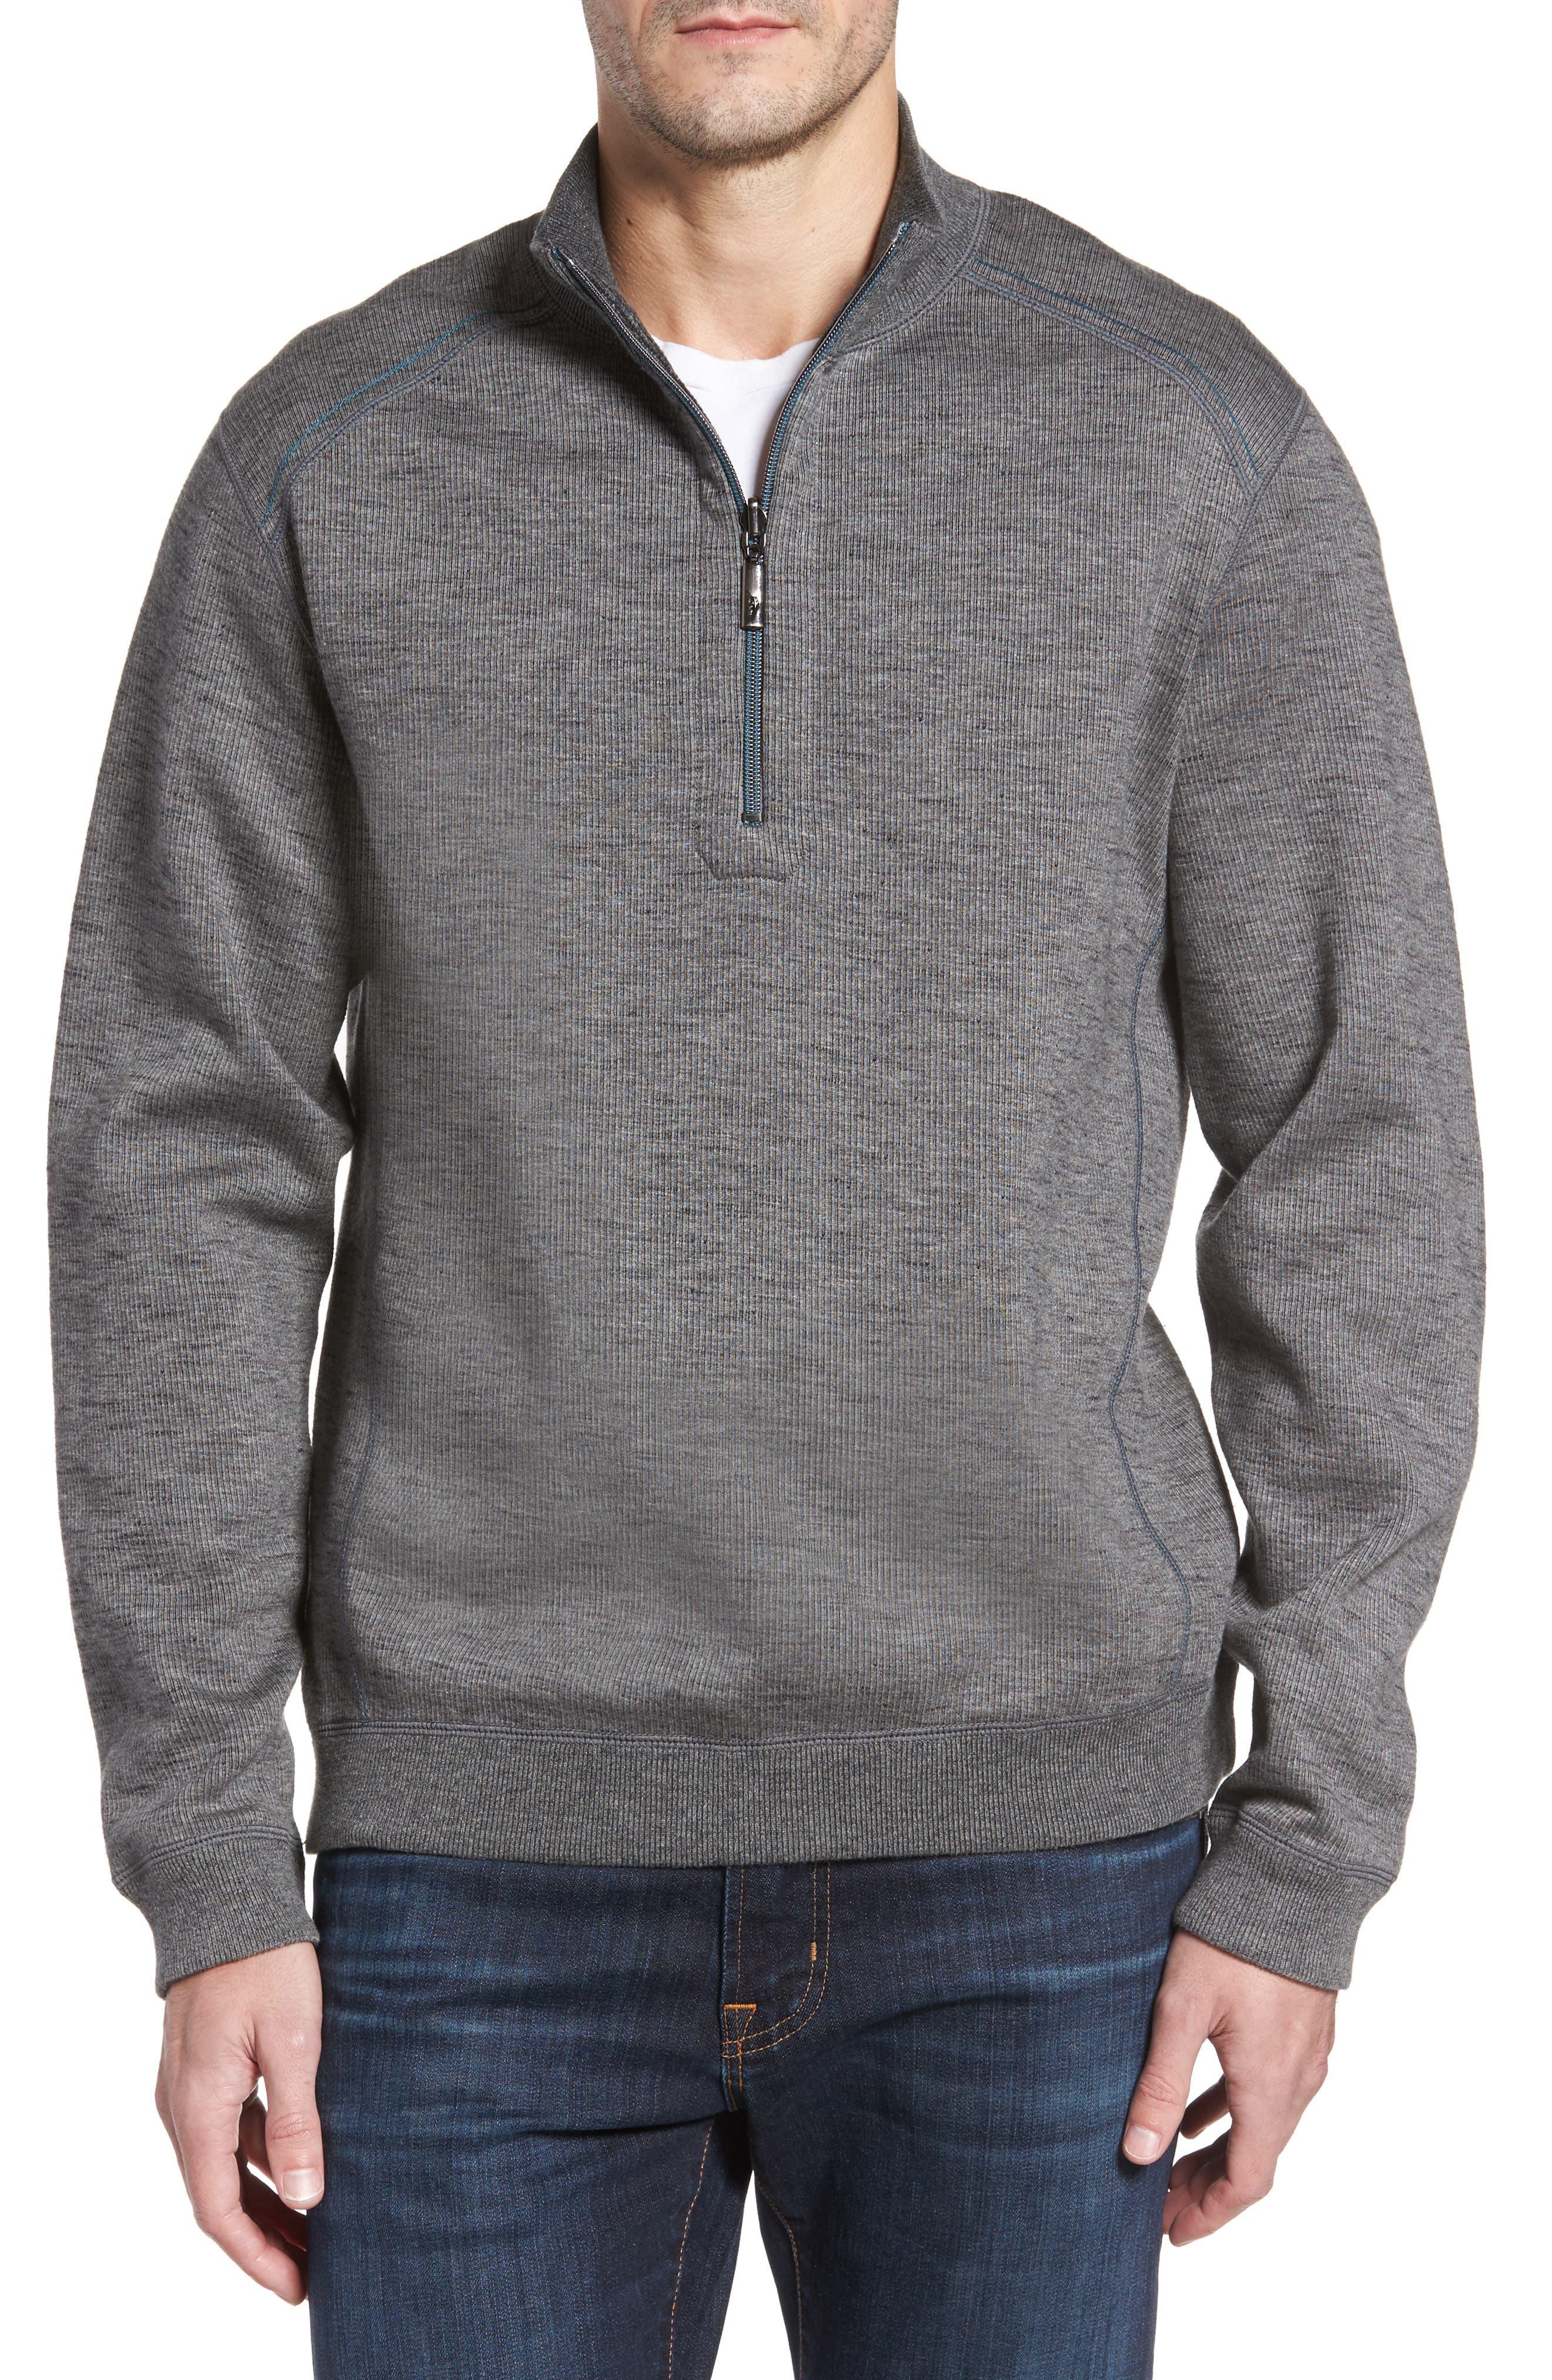 Alternate Image 1 Selected - Tommy Bahama Flipsider Half Zip Reversible Sweatshirt